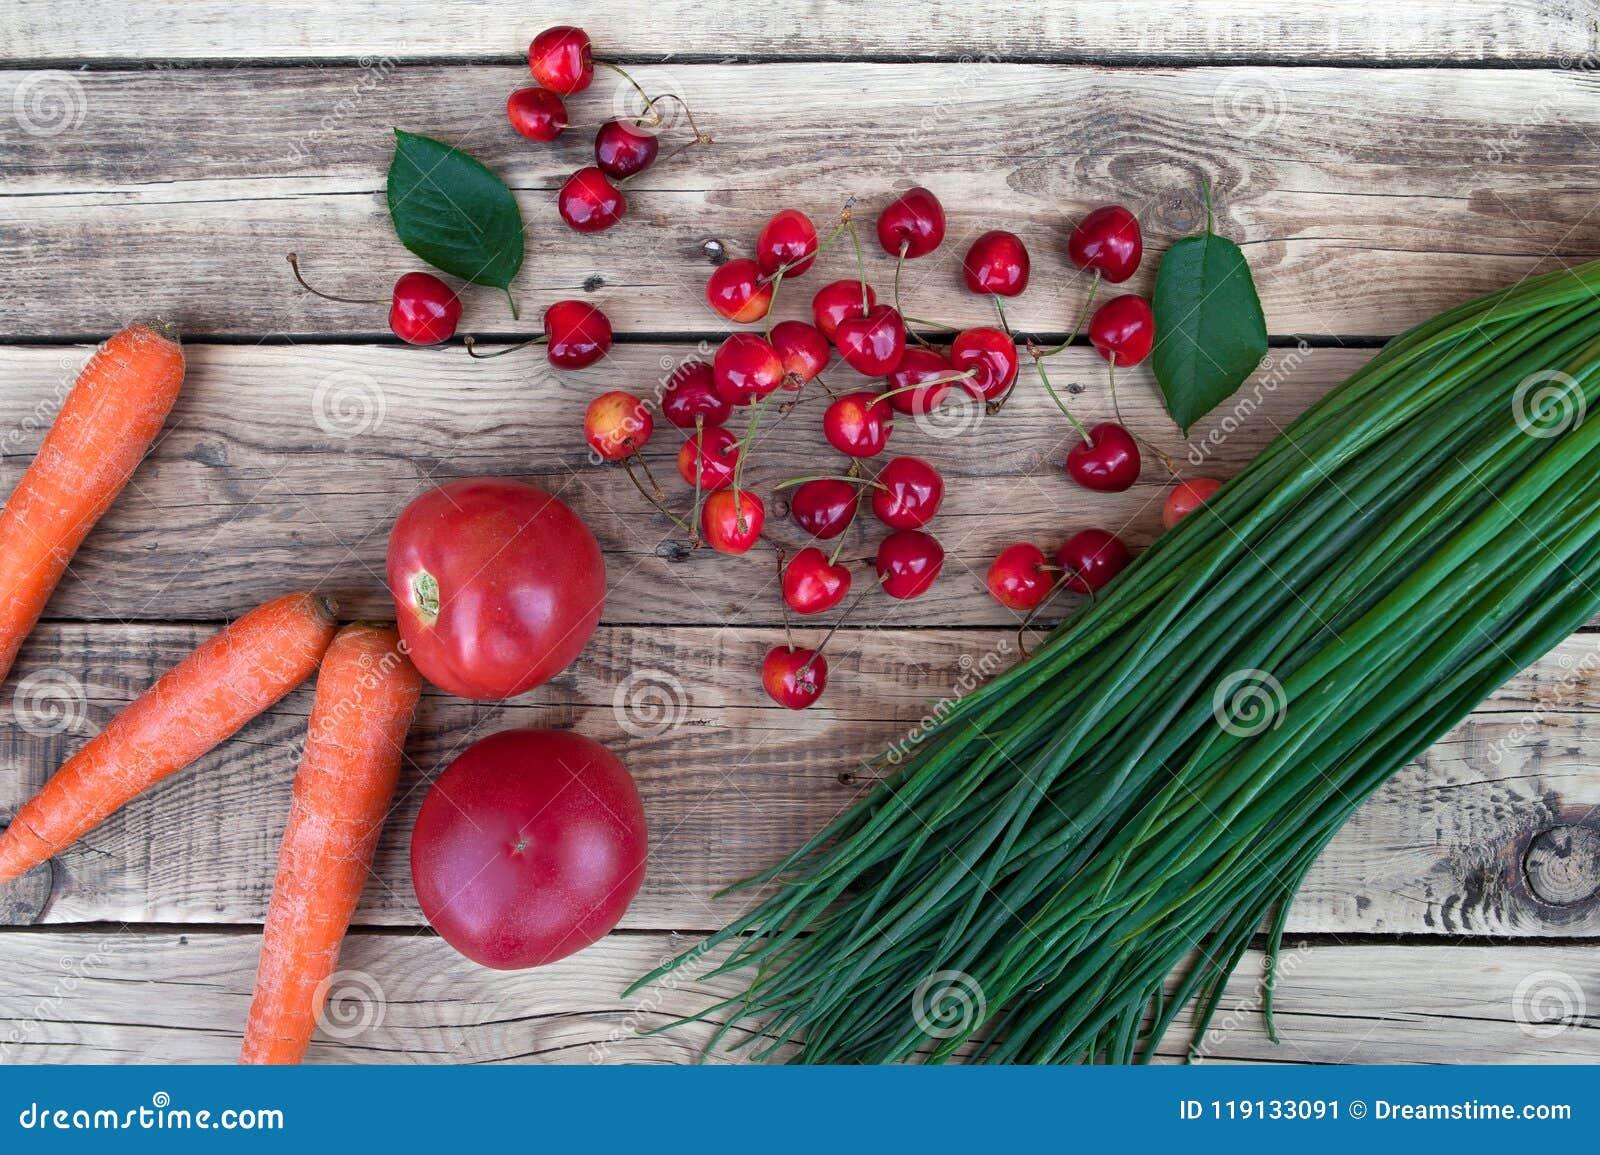 Groene uien, gewassen wortelen, rode tomaten, groenten